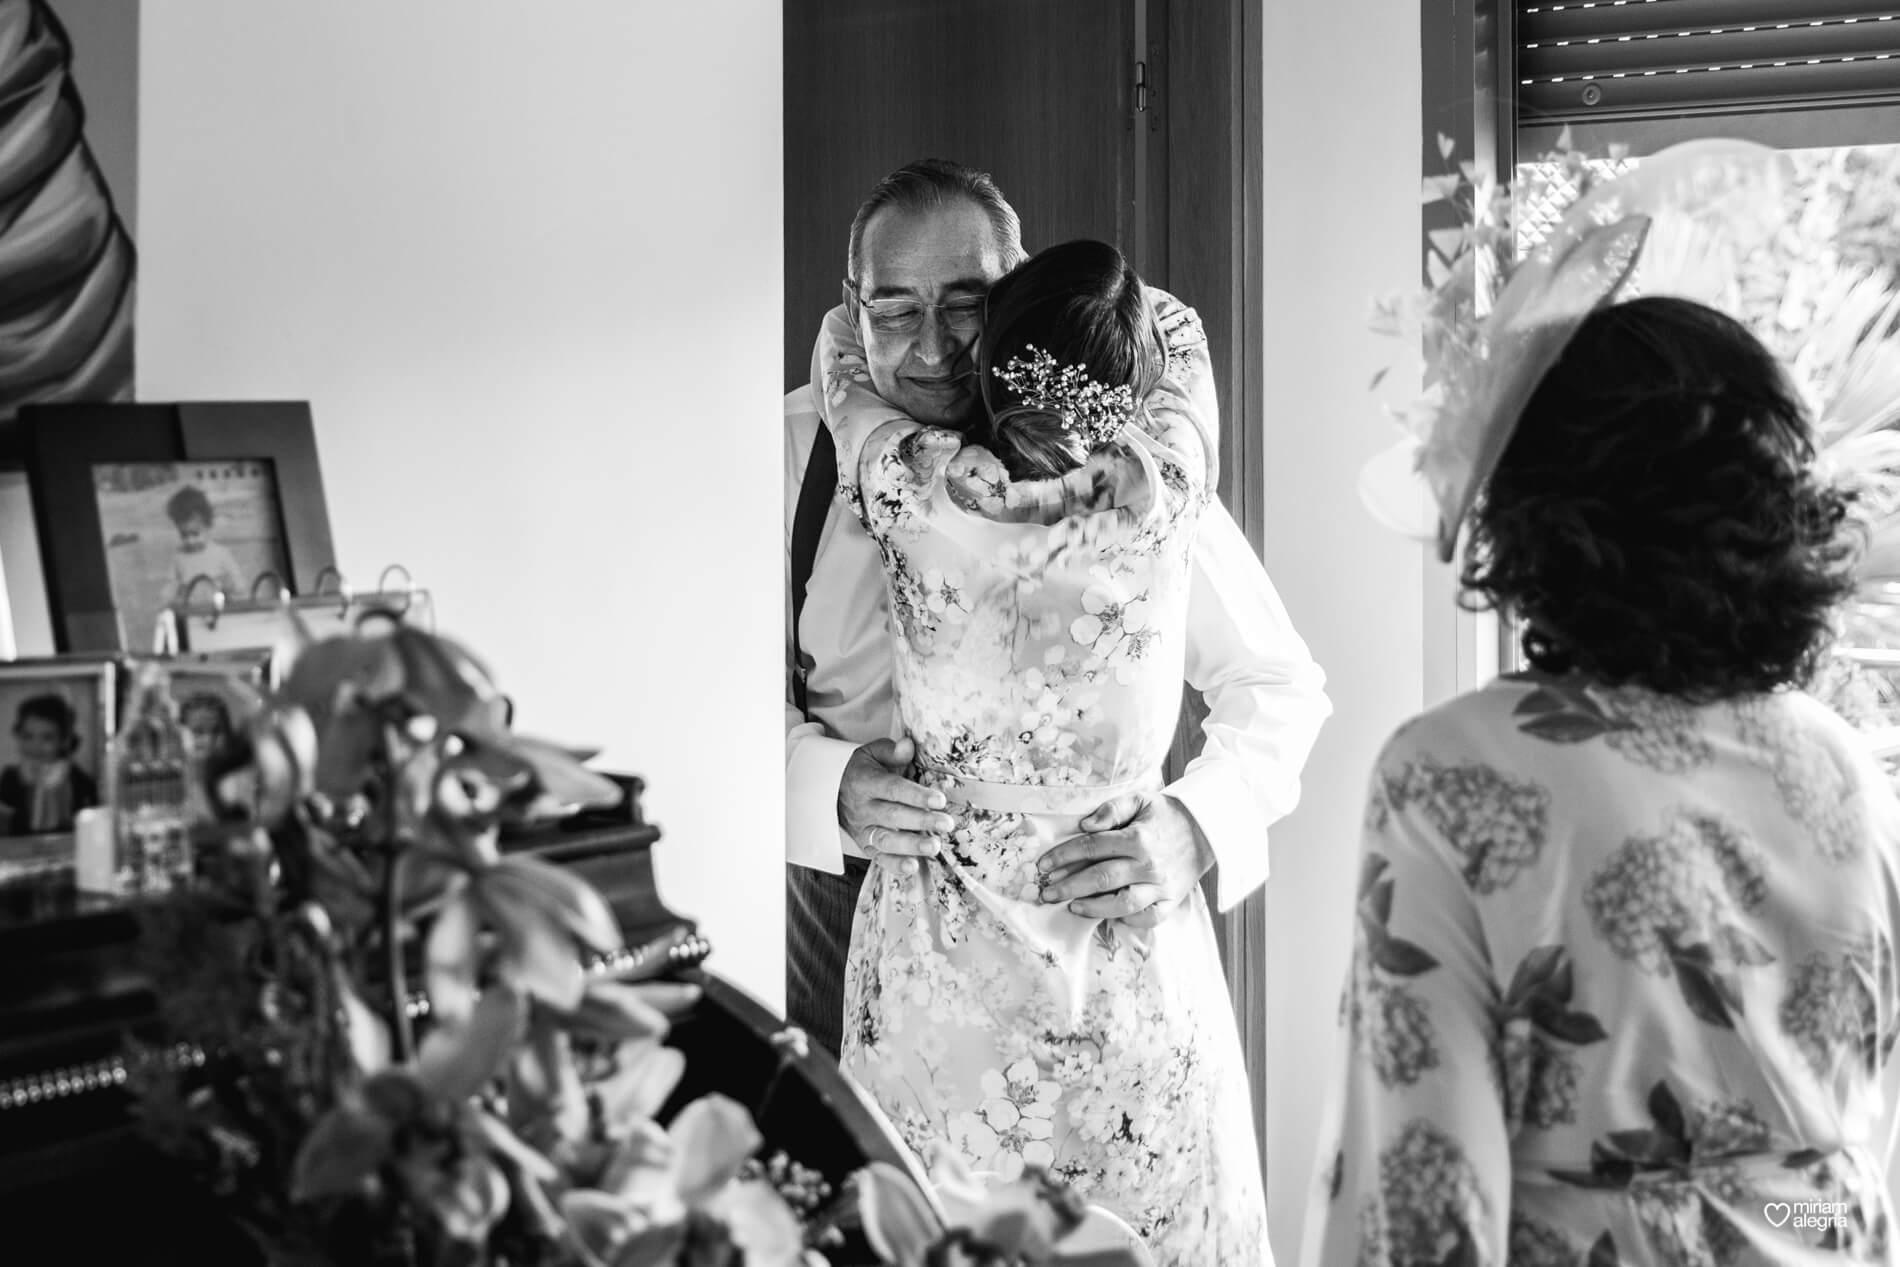 vestido-de-novia-paula-del-vas-miriam-alegria-fotografos-boda-murcia-19